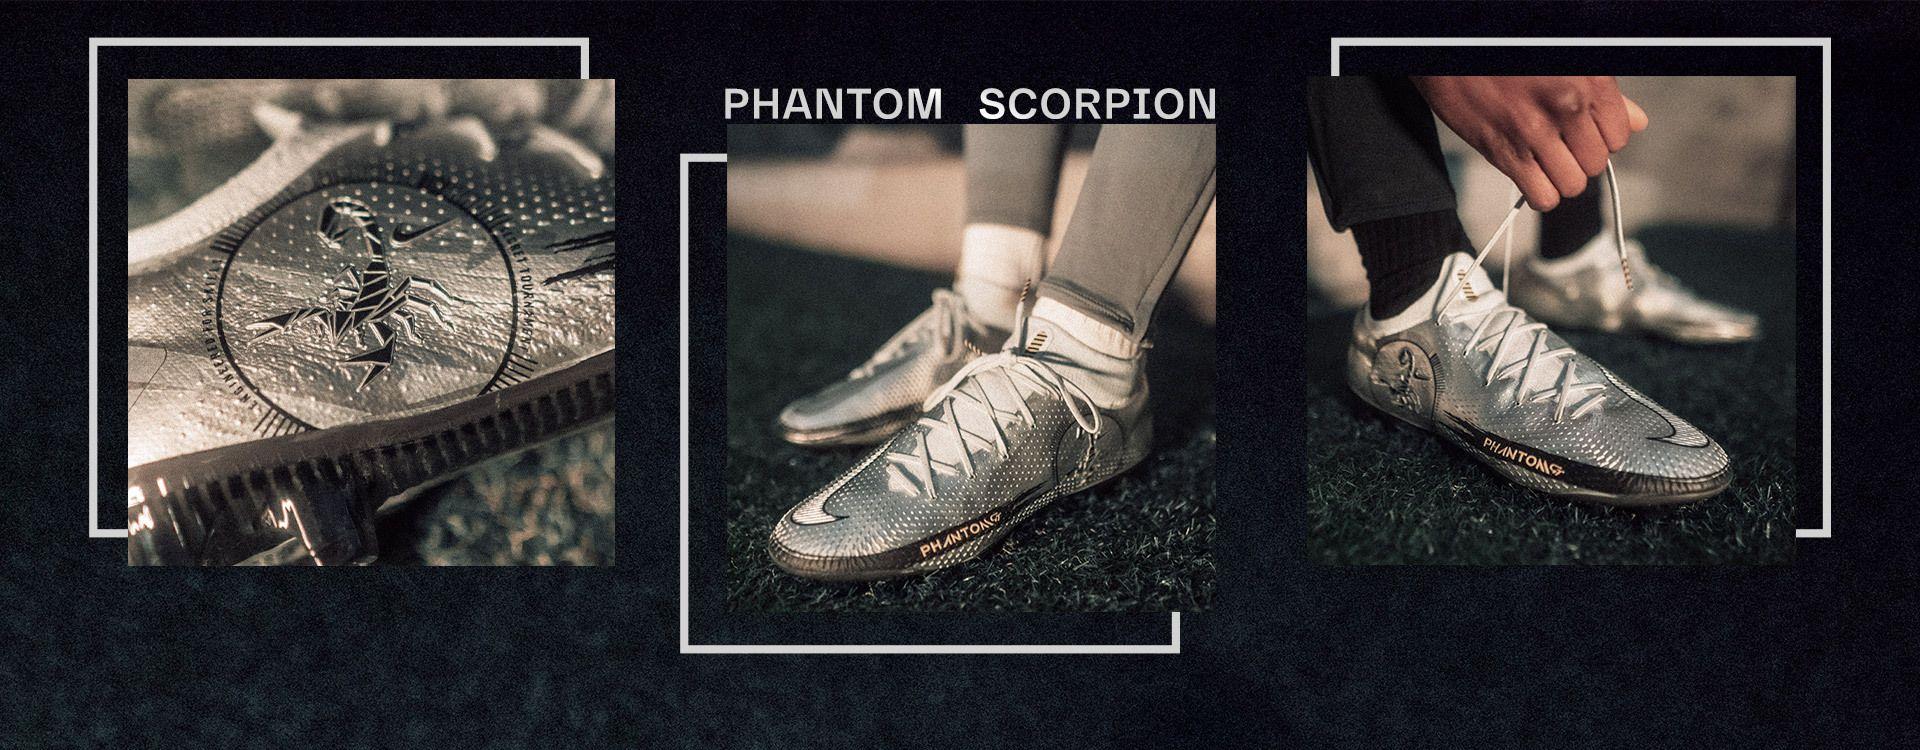 nike scorpion